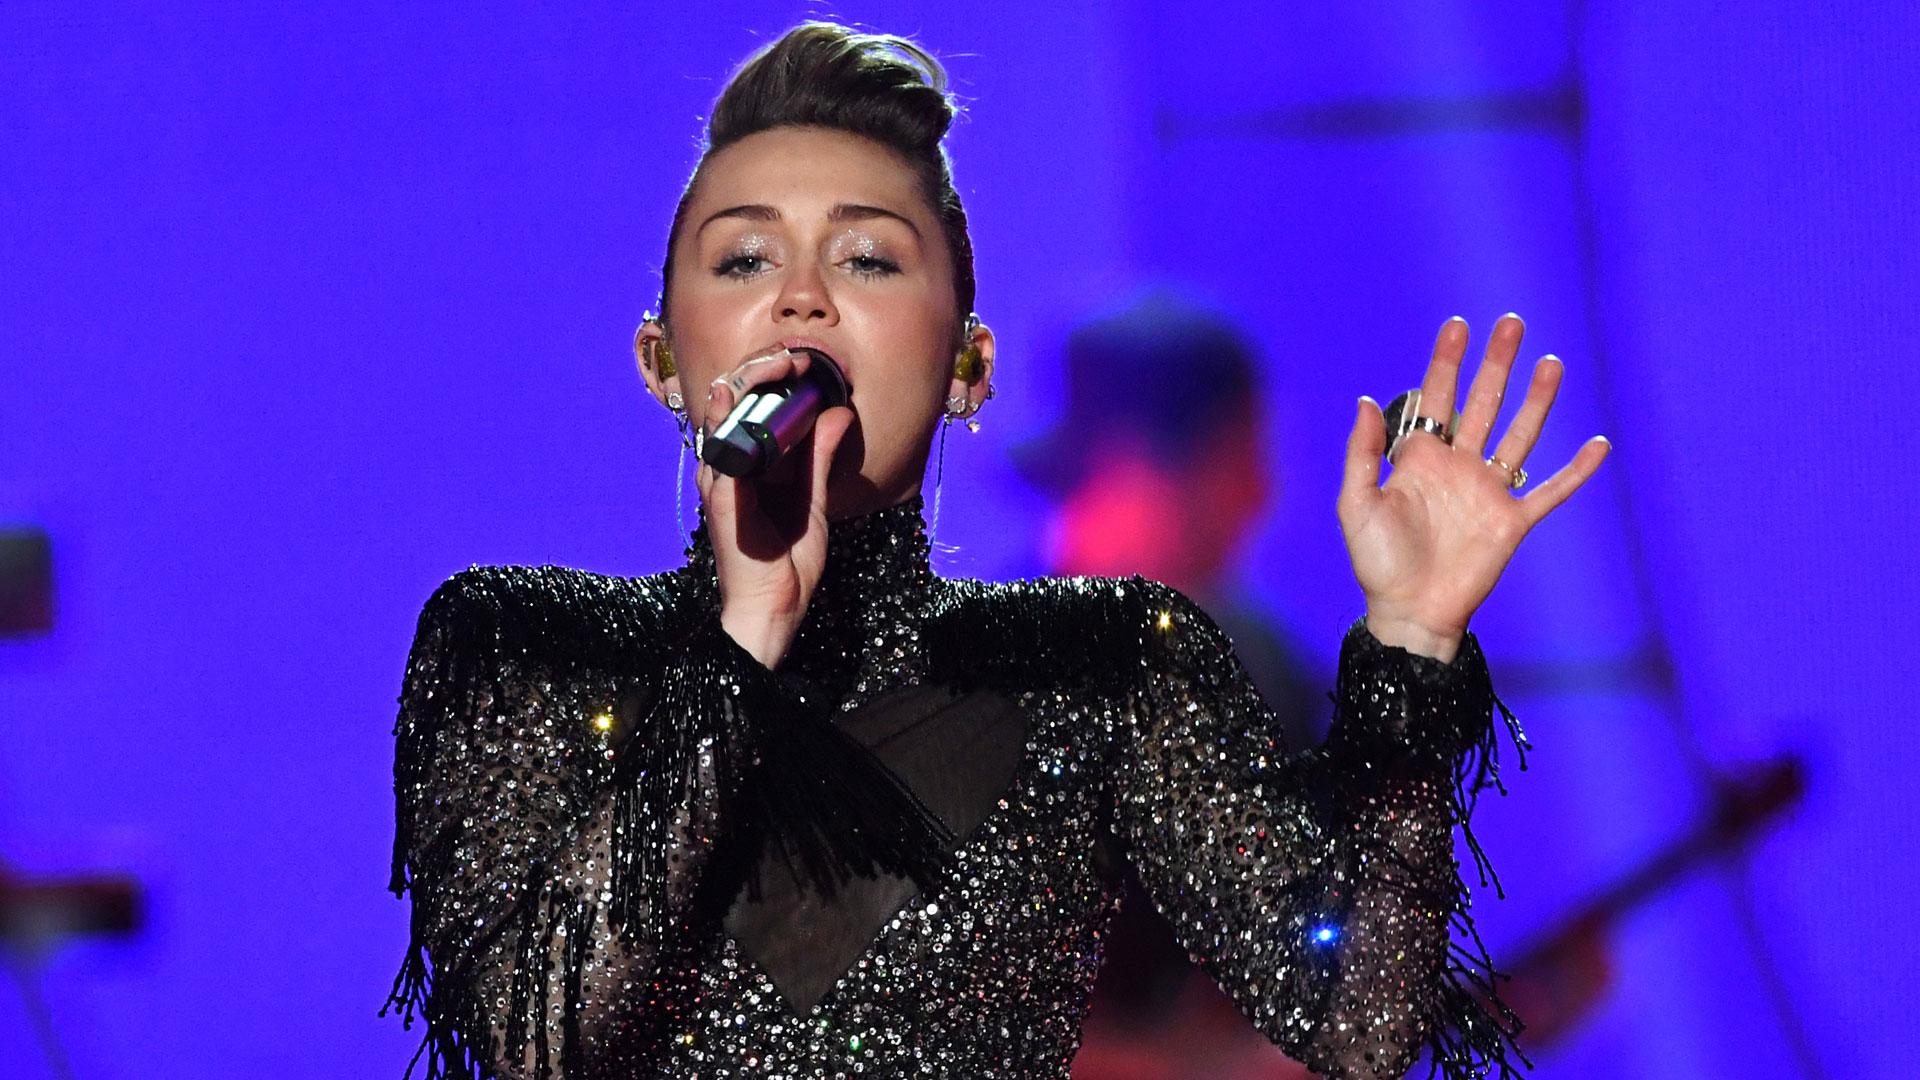 Miley Cyrus at 2017 iHeartRadio festival86300166-159532